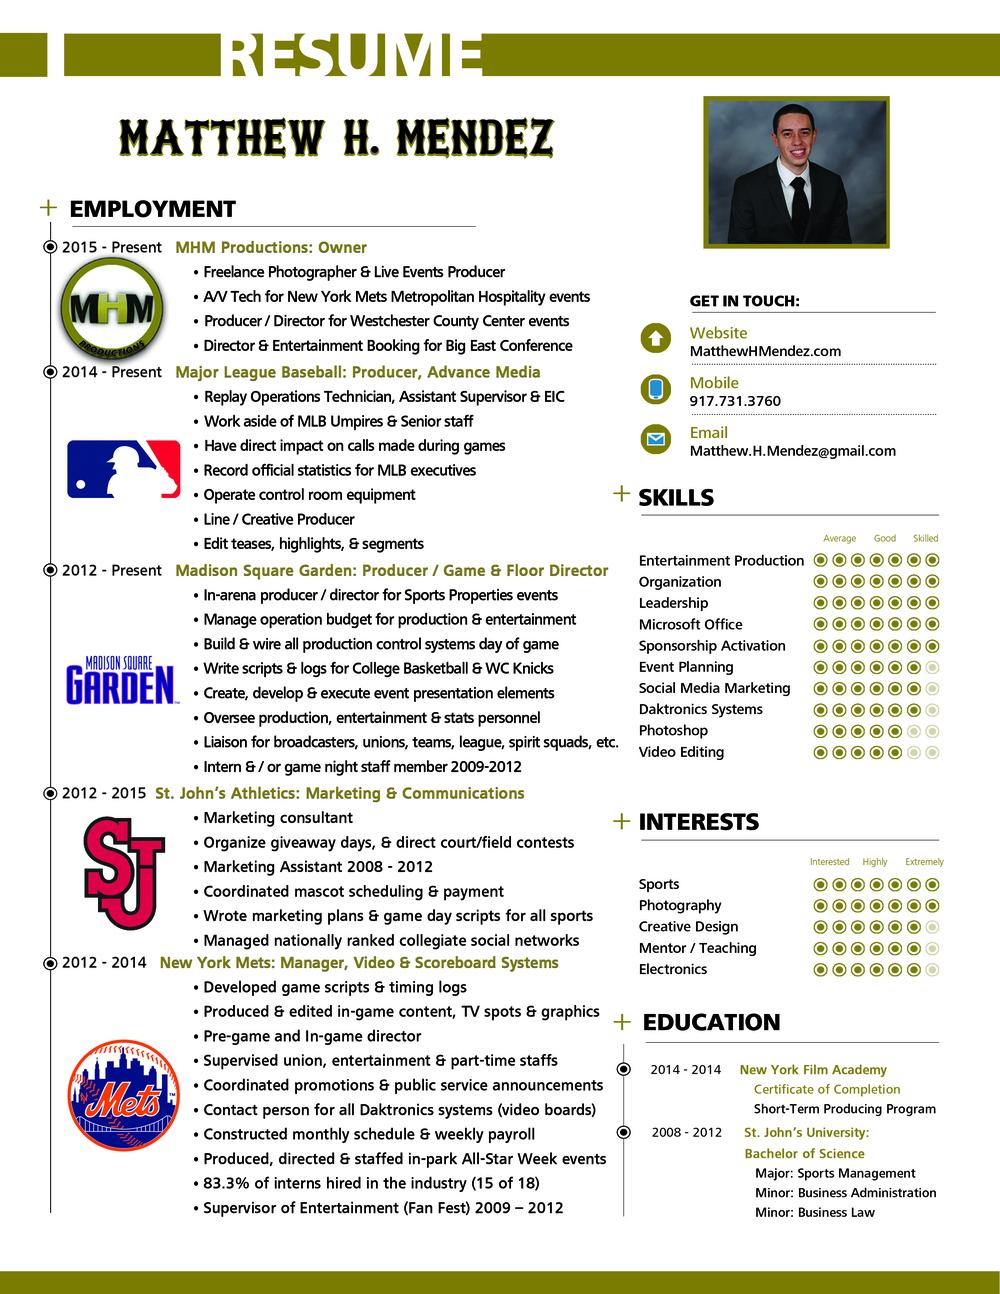 Matthew H Mendez Infographic Resume.jpg